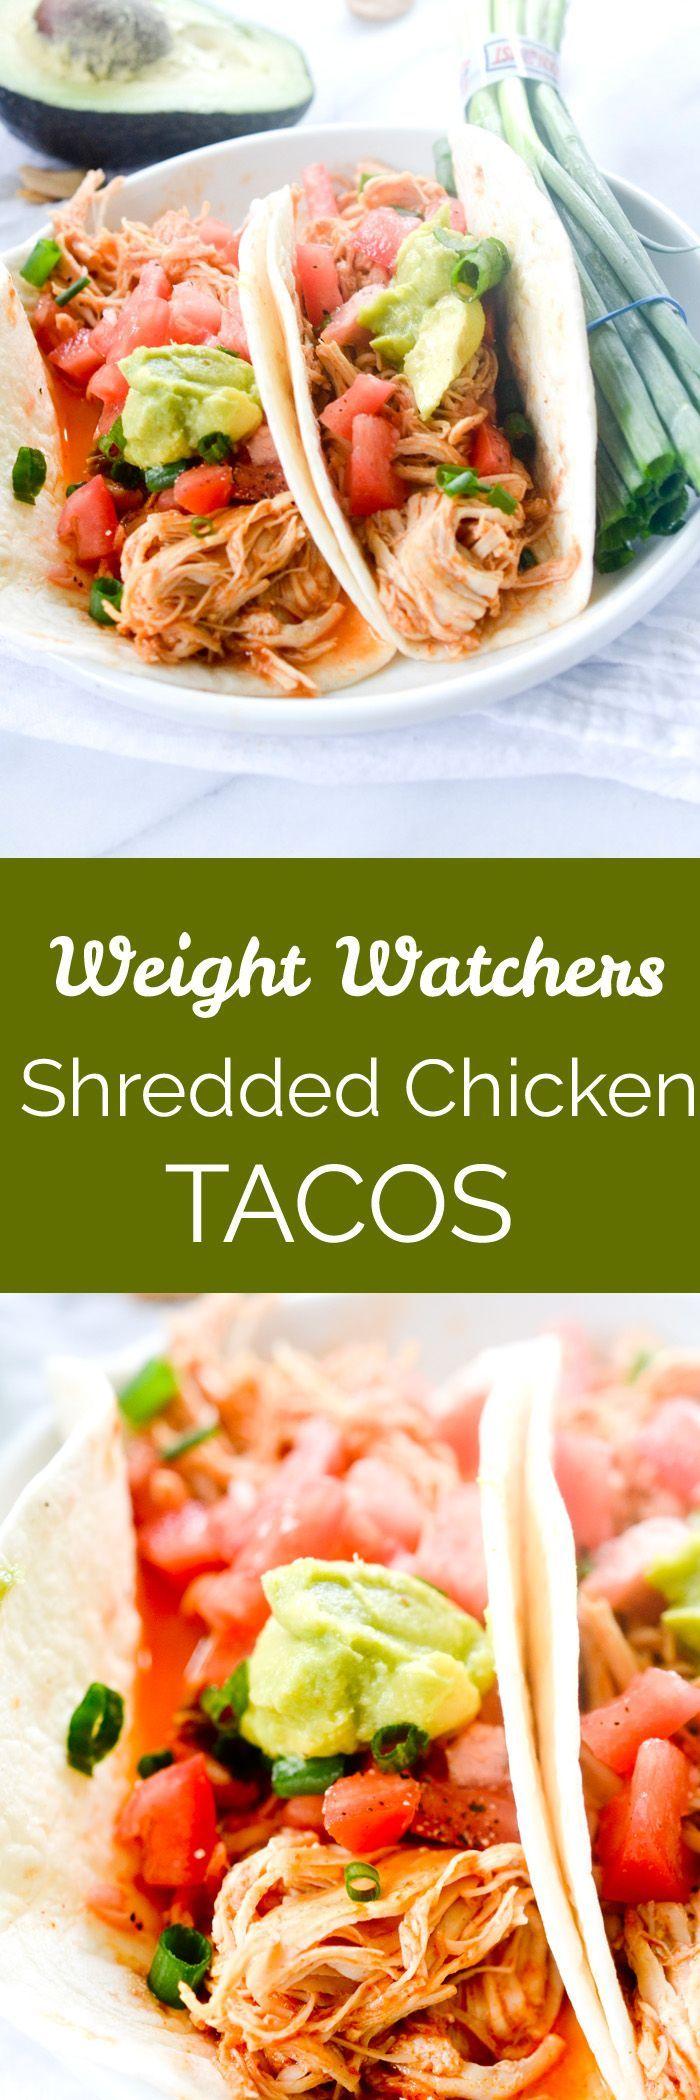 Weight Watchers Shredded Chicken Tacos #shreddedchickentacos